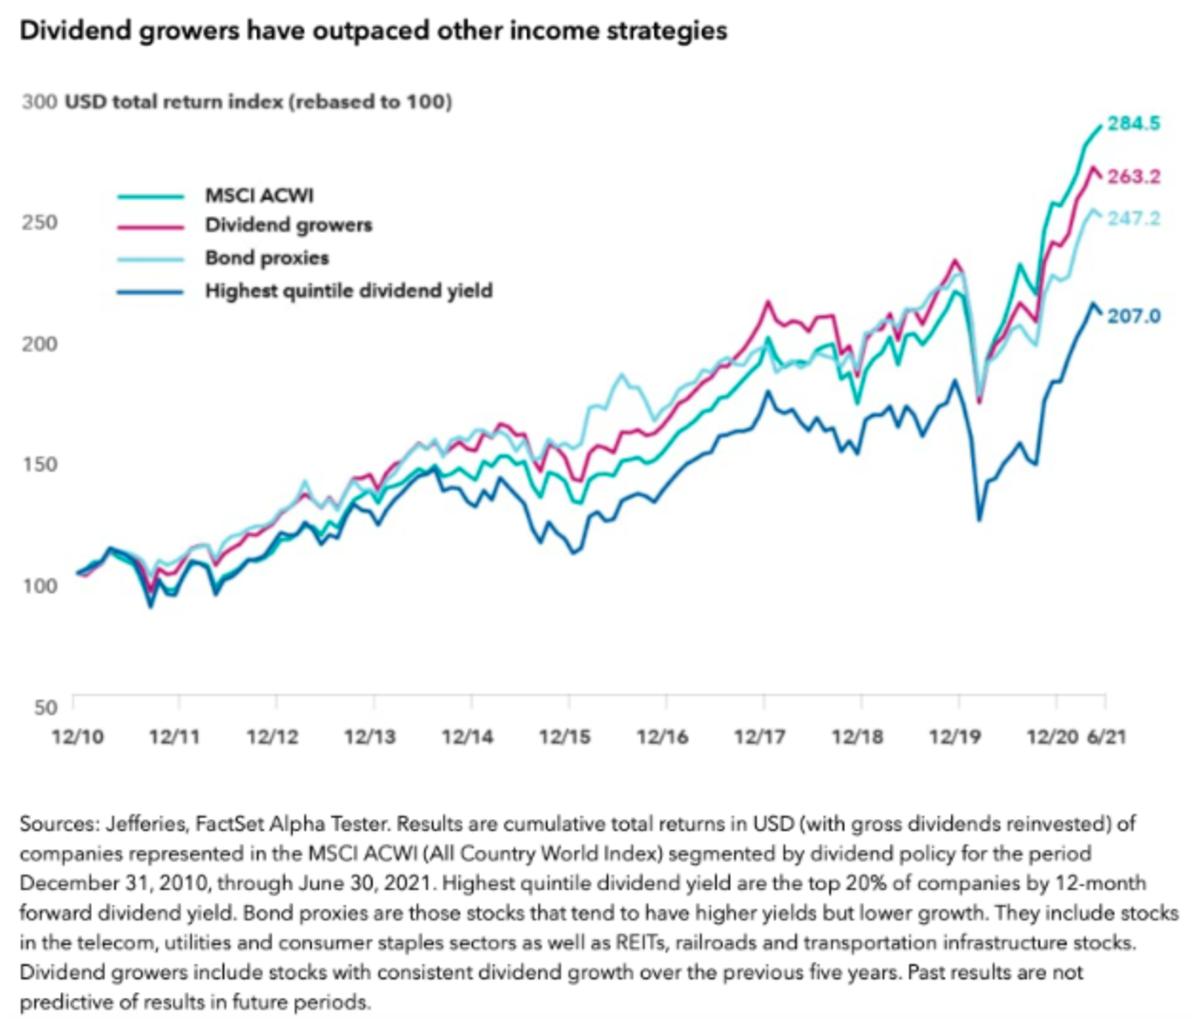 Source: Capital Group Investor Presentation